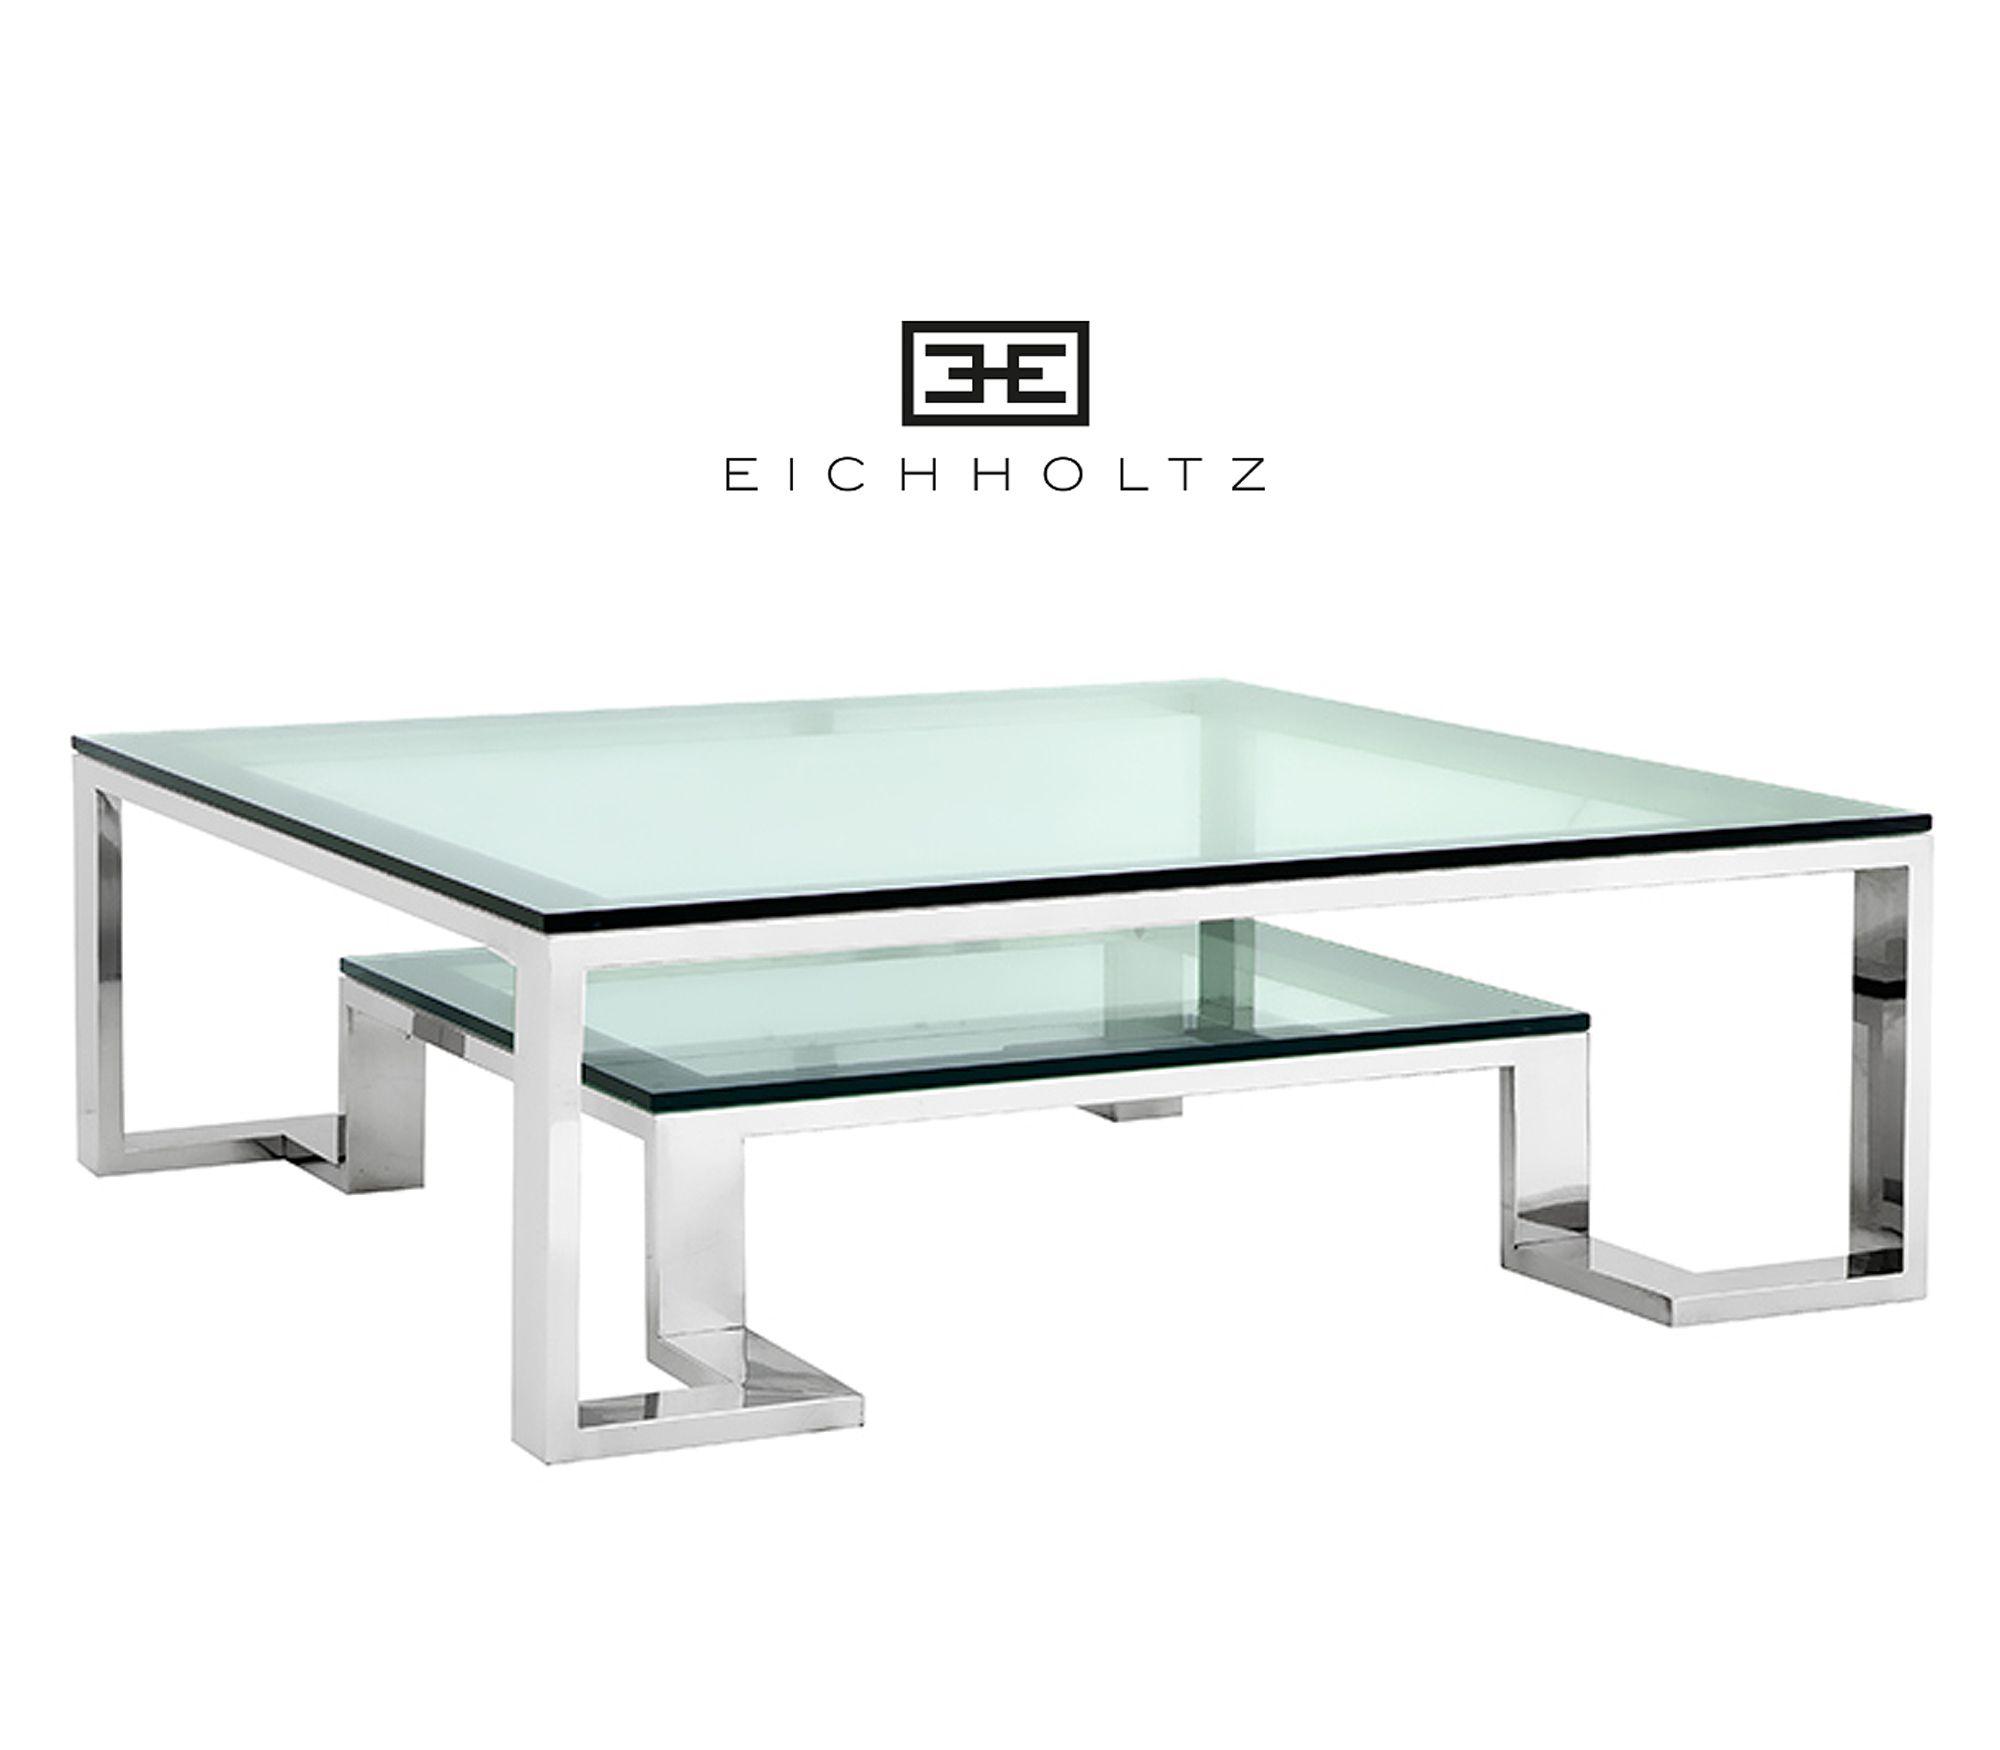 Salontafel Messing Met Glasplaat.Eichholtz Coffee Table Huntington Salontafel Glasplaat 120 X120cm